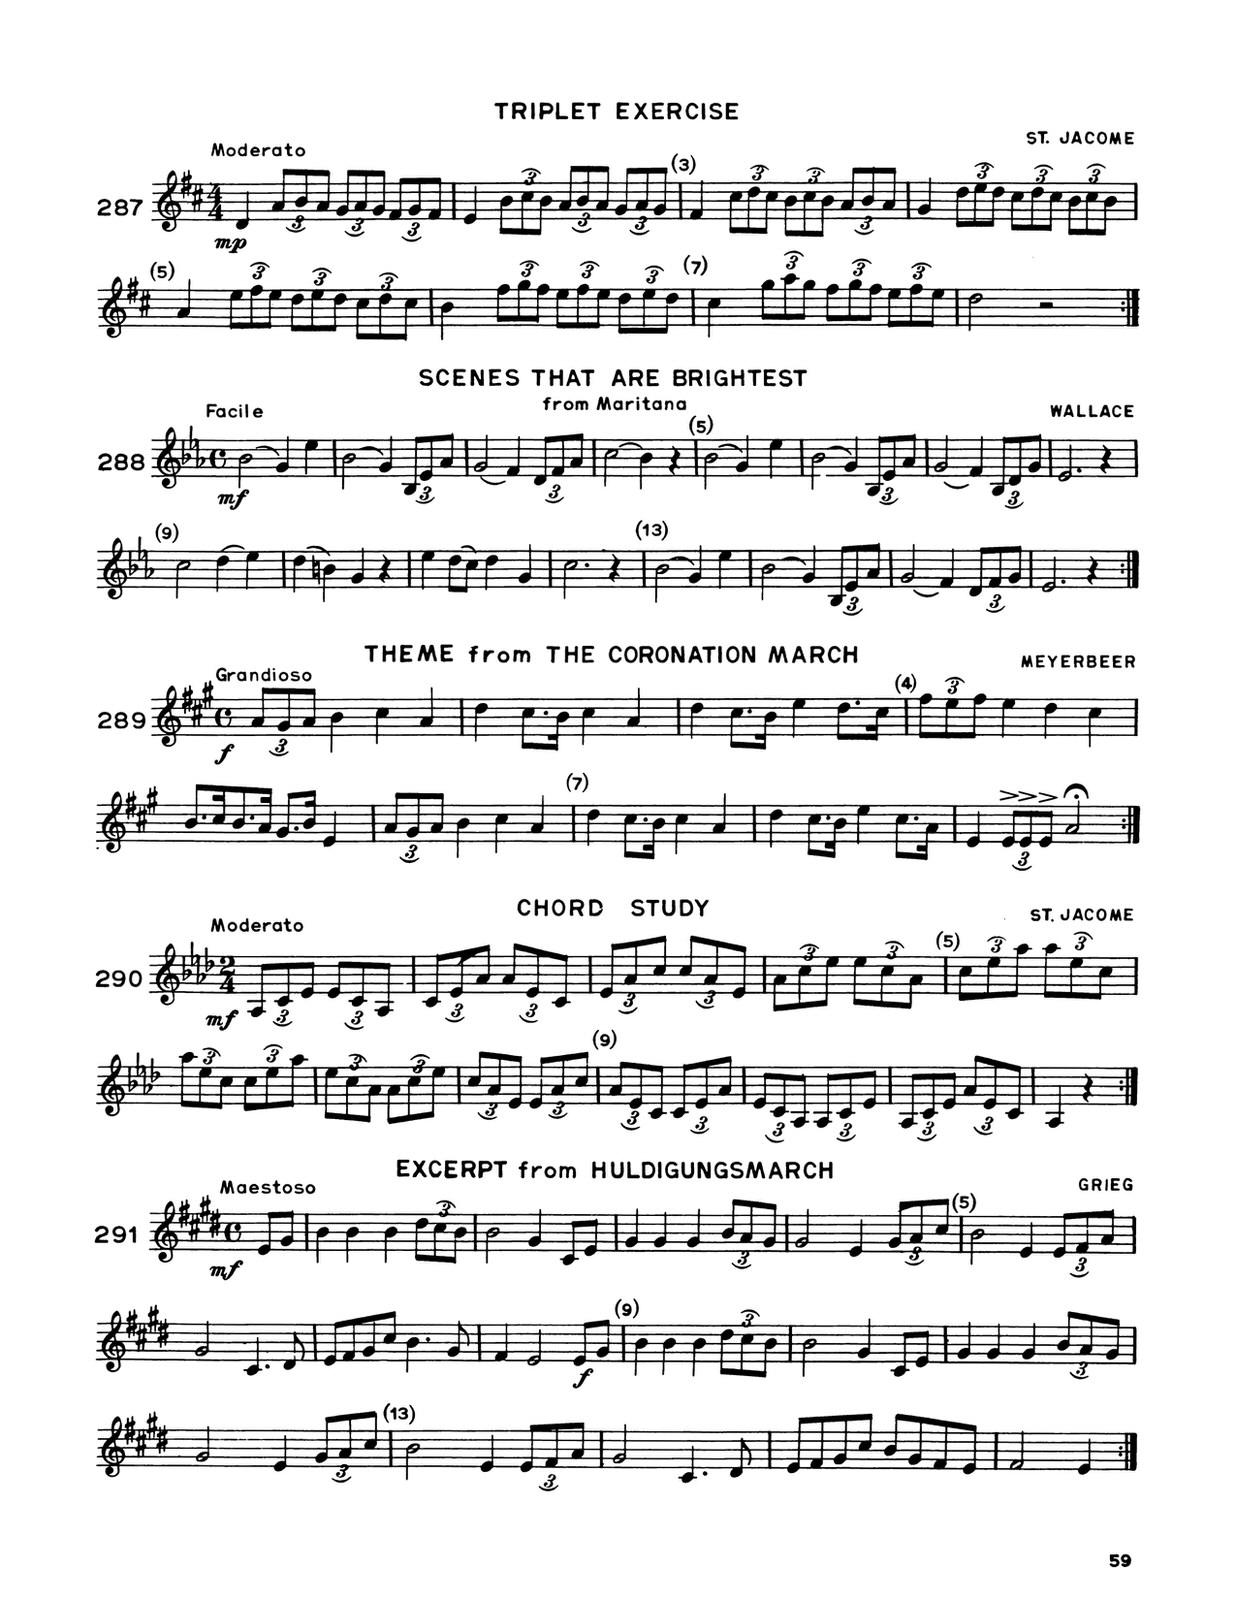 Whistler, Modern Arban-St.Jacome for Trumpet 6